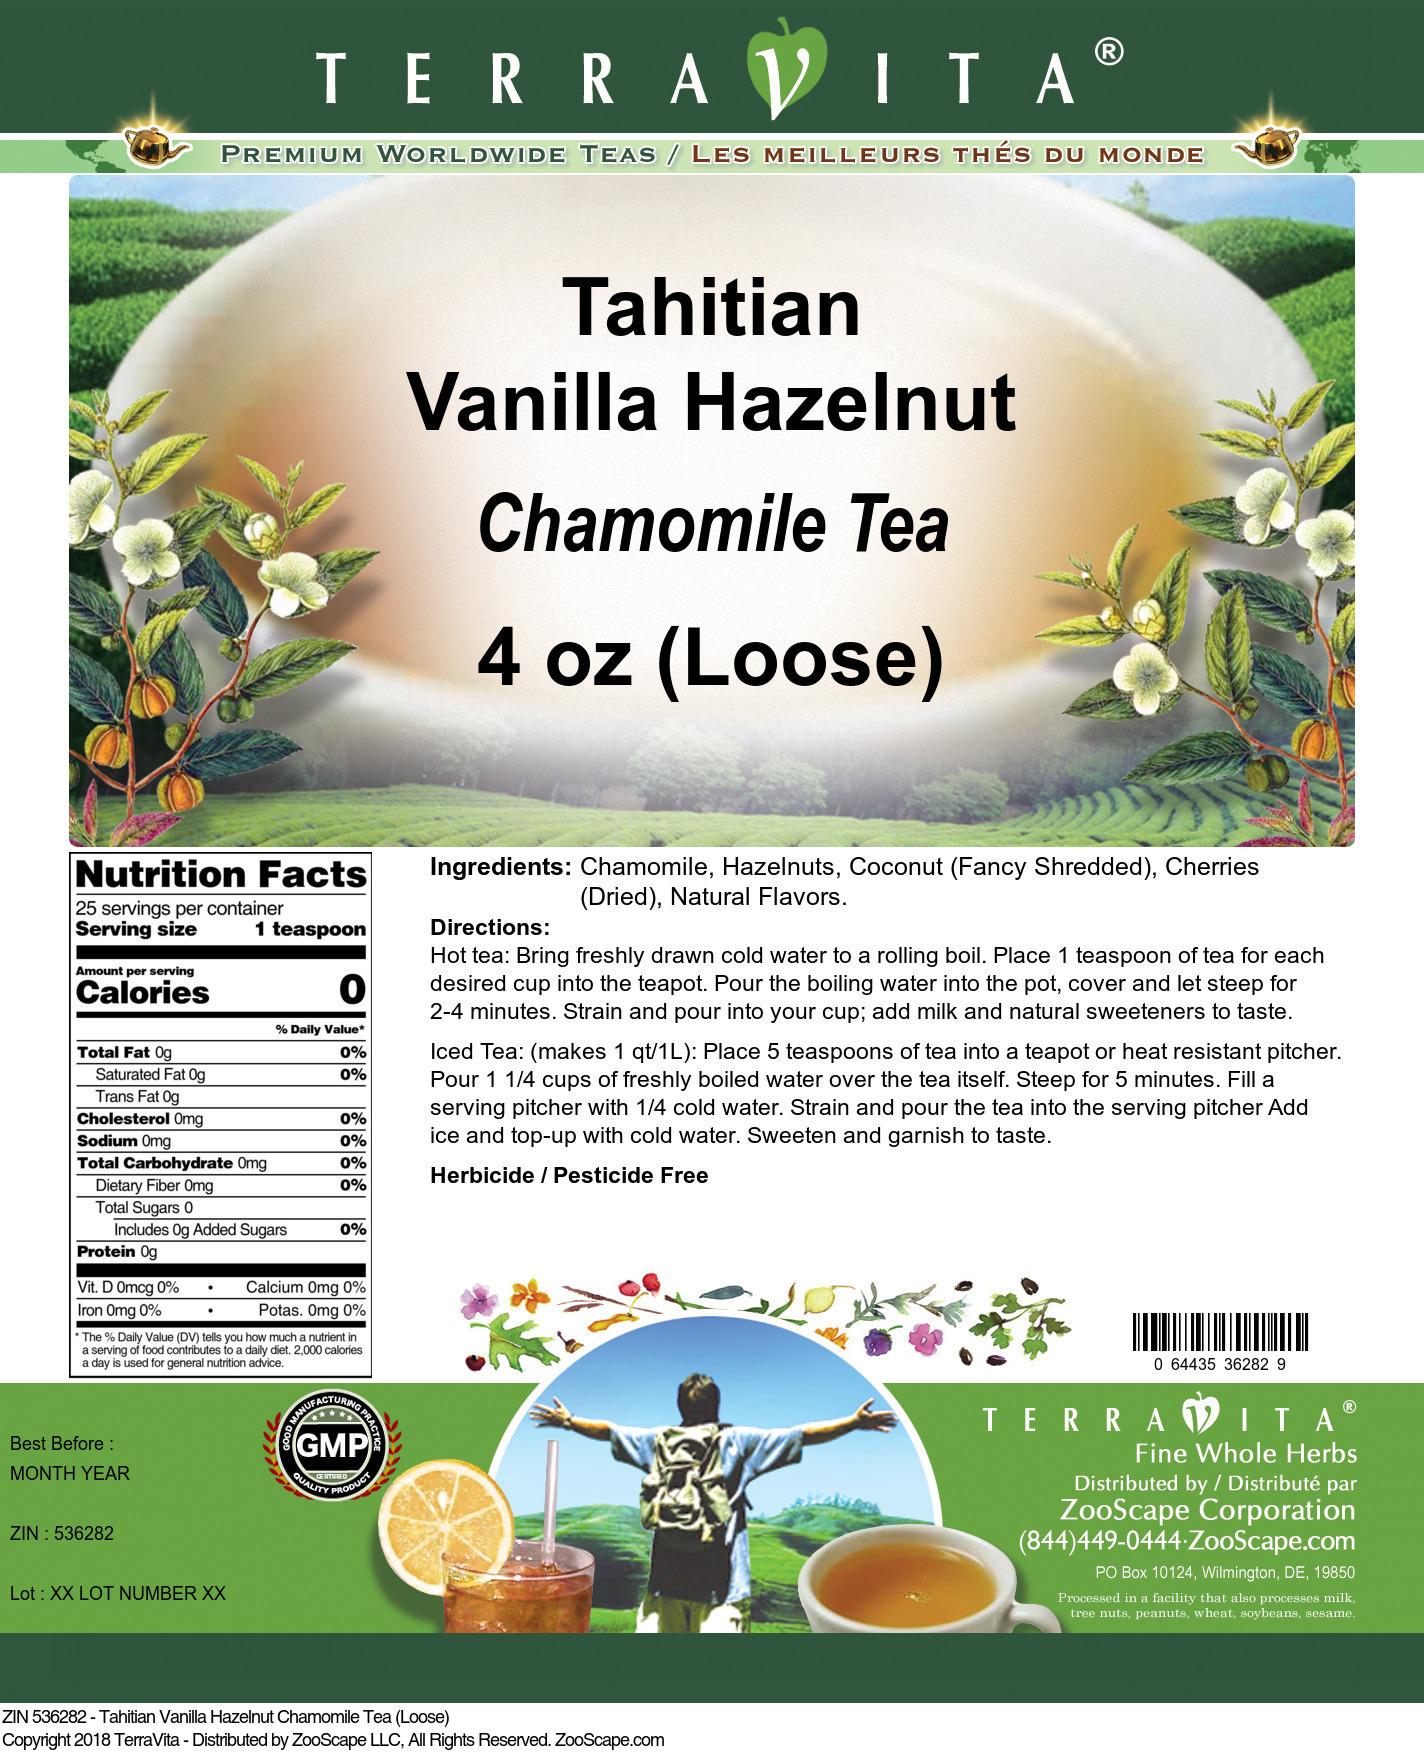 Tahitian Vanilla Hazelnut Chamomile Tea (Loose)